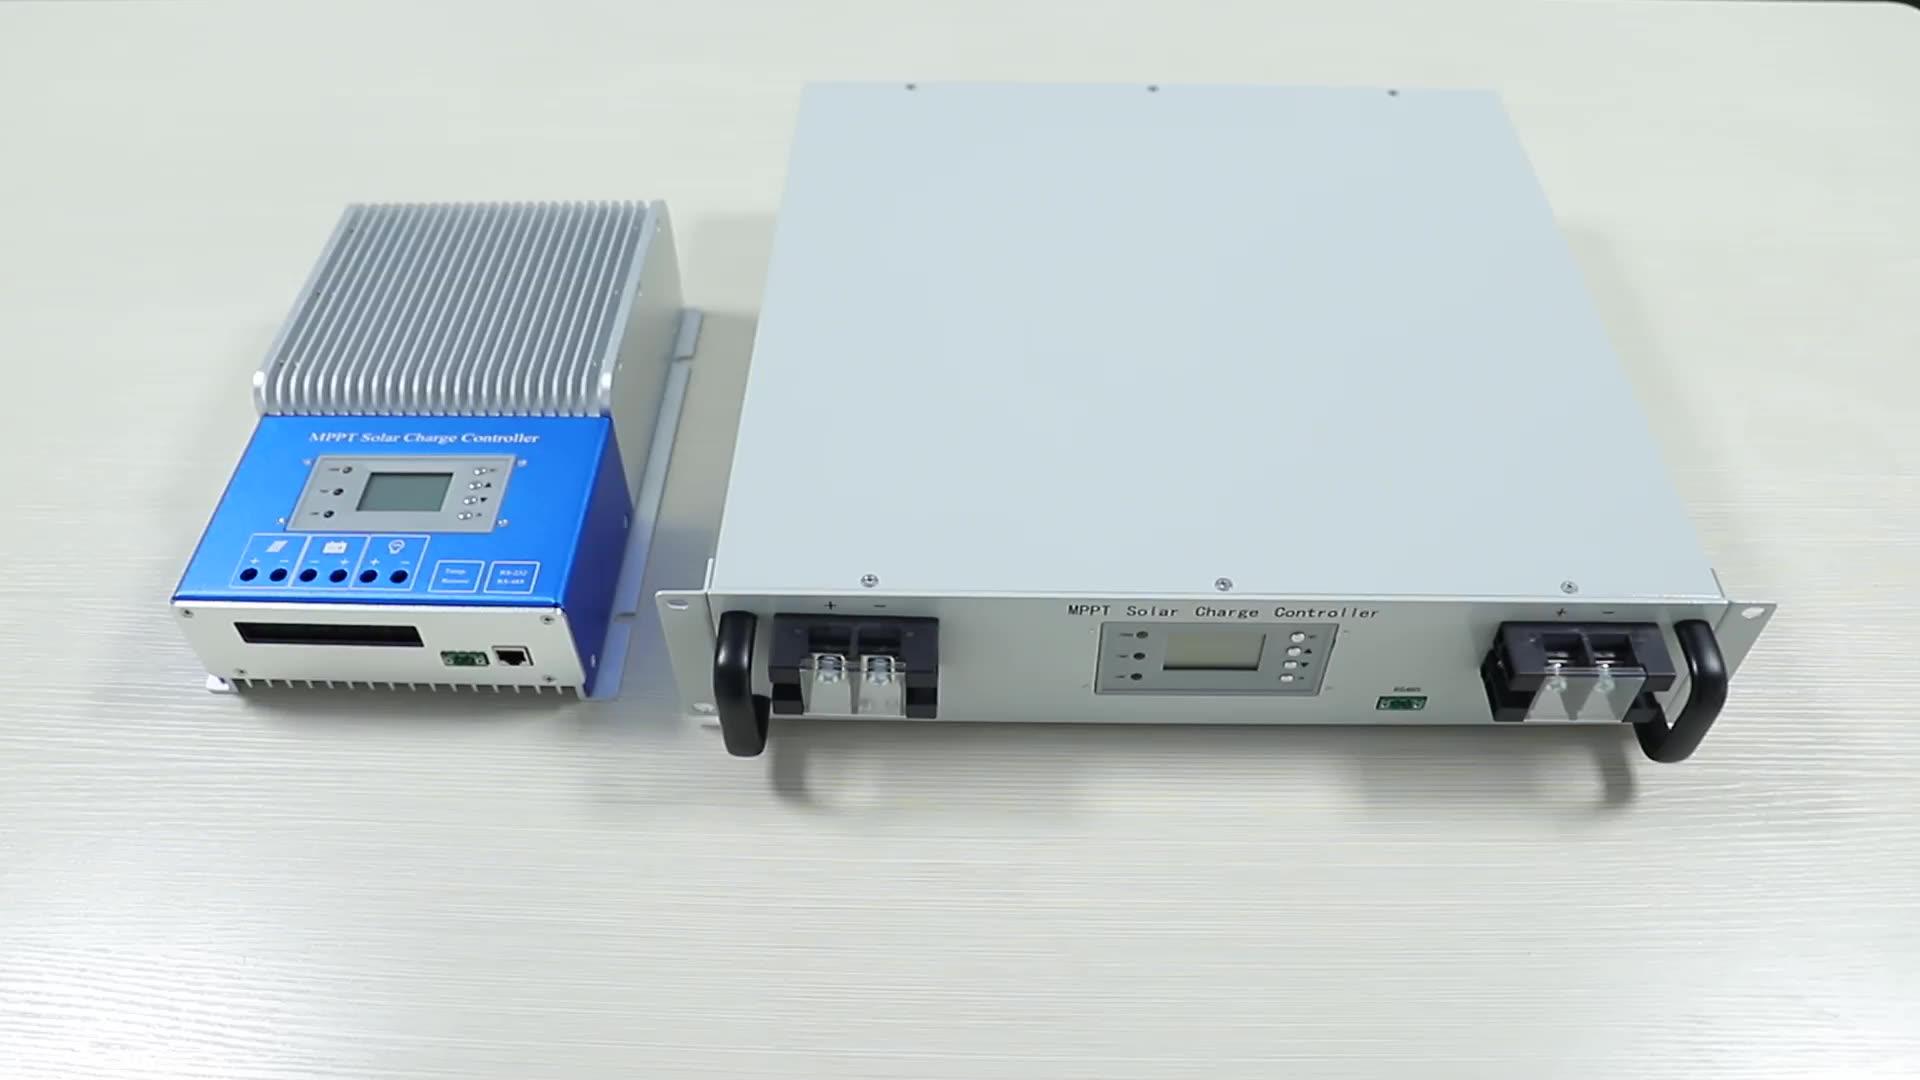 12v 24V 60A mppt 태양 충전 컨트롤러 1600w soalr 패널 충전